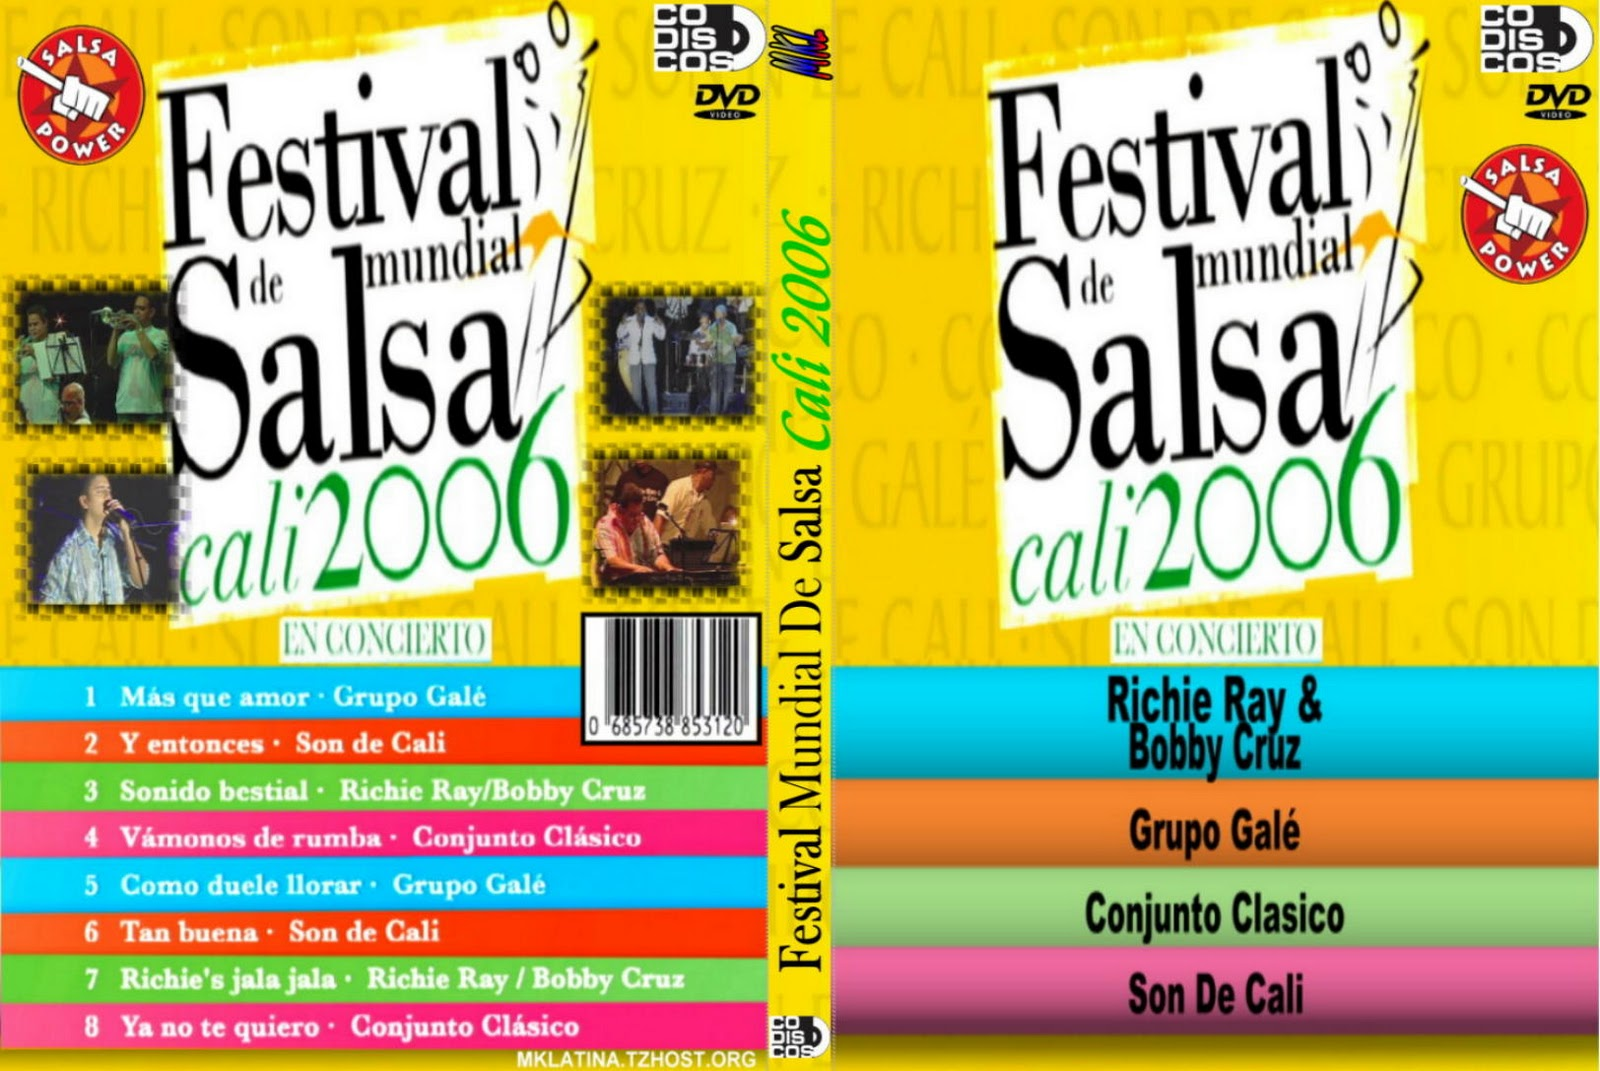 http://2.bp.blogspot.com/_dpj8cXZxGgs/TMNHCQiFKuI/AAAAAAAAAKE/INSokkQvmn8/s1600/festival+mundial+de+salsa+cali+2006.JPG